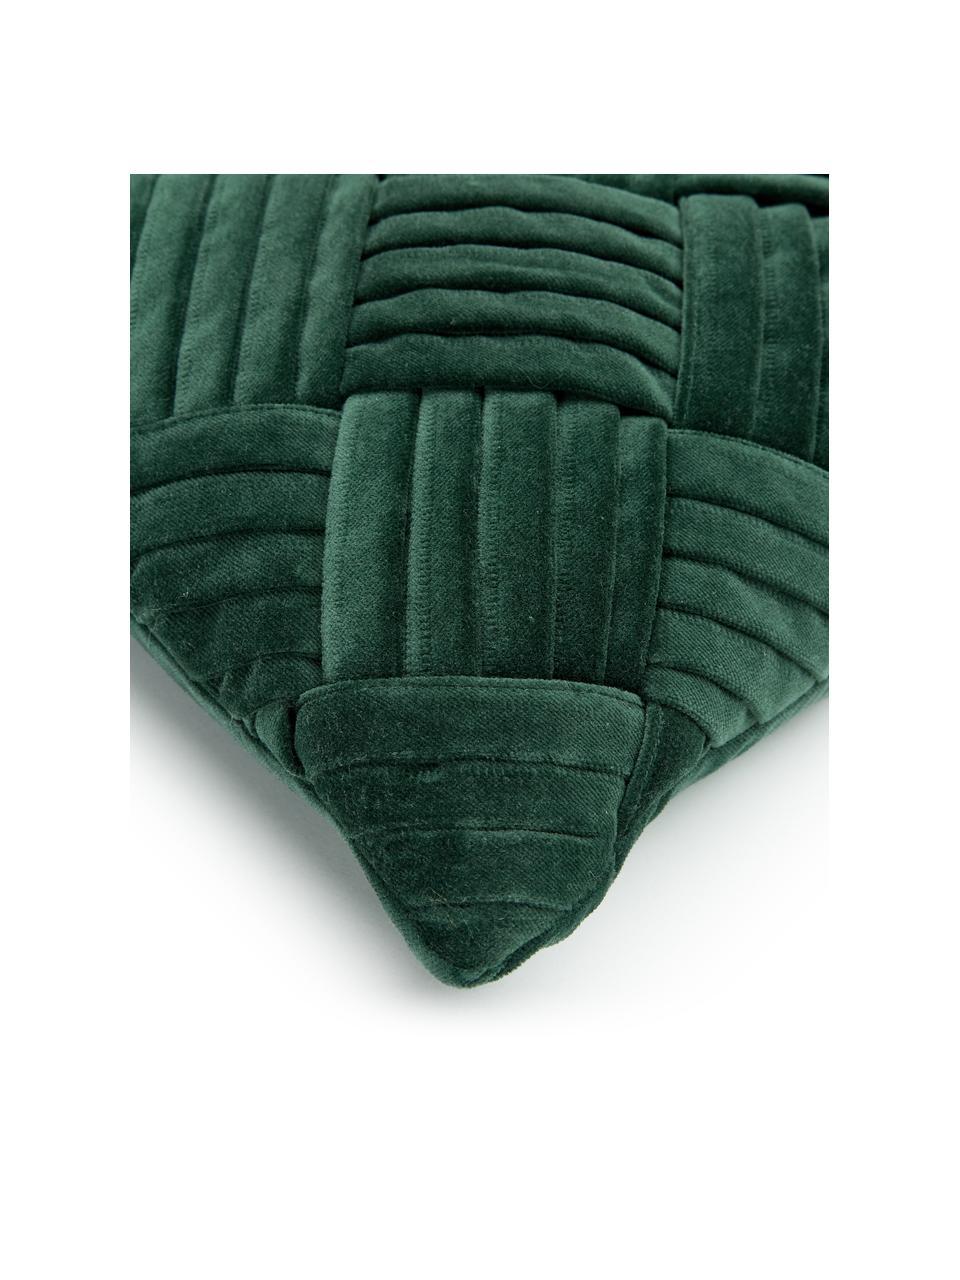 Housse de coussin rectangulaire velours Sina, Vert